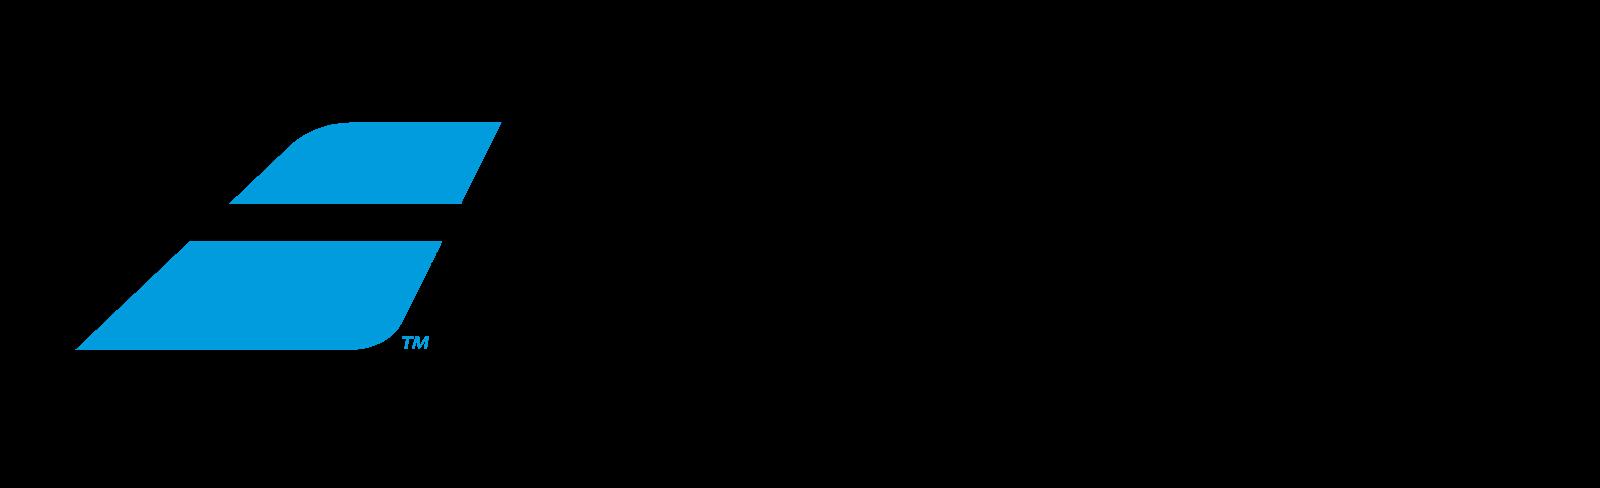 Patrocinador principal: BABOLAT